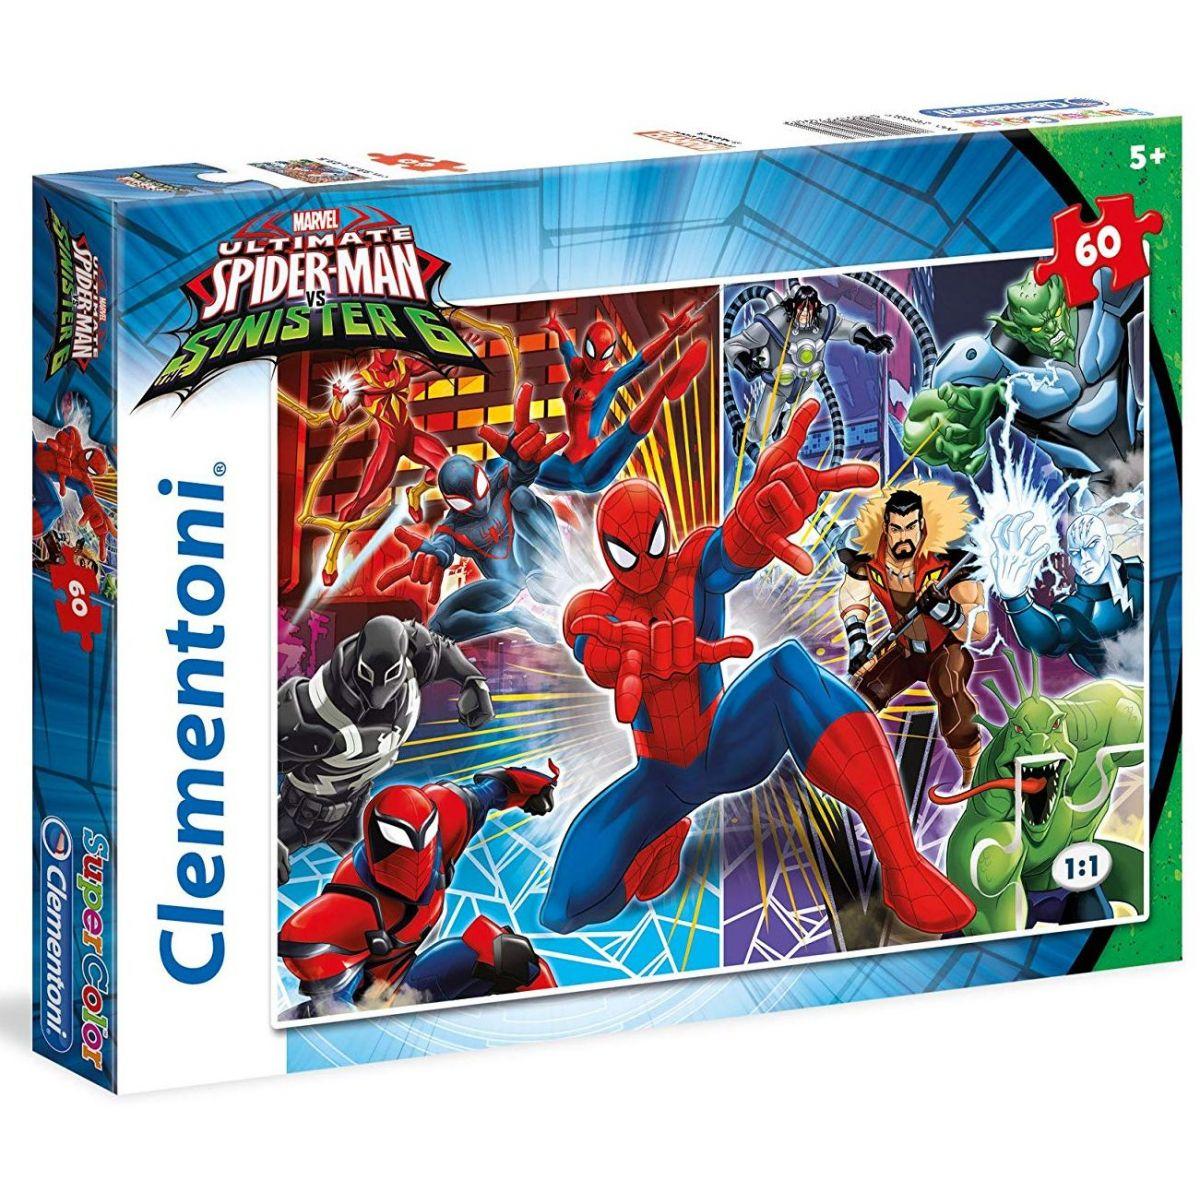 Clementoni Spiderman a Sinister 6 Puzzle Supercolor 60 dielikov